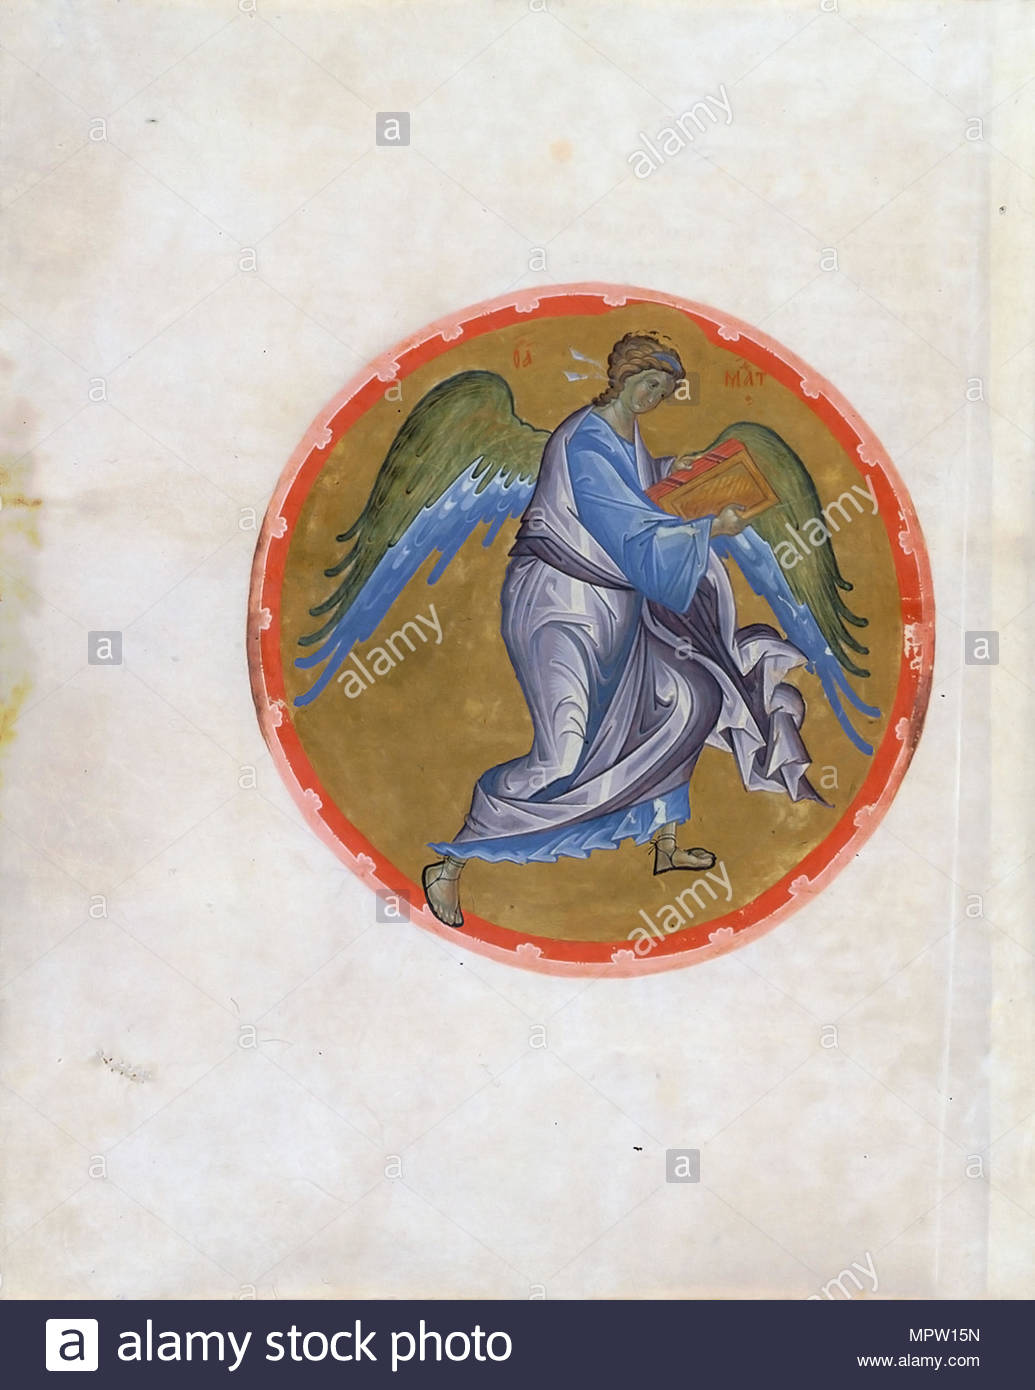 Angel Symbol Of Matthew The Evangelist From The Morozov Gospel